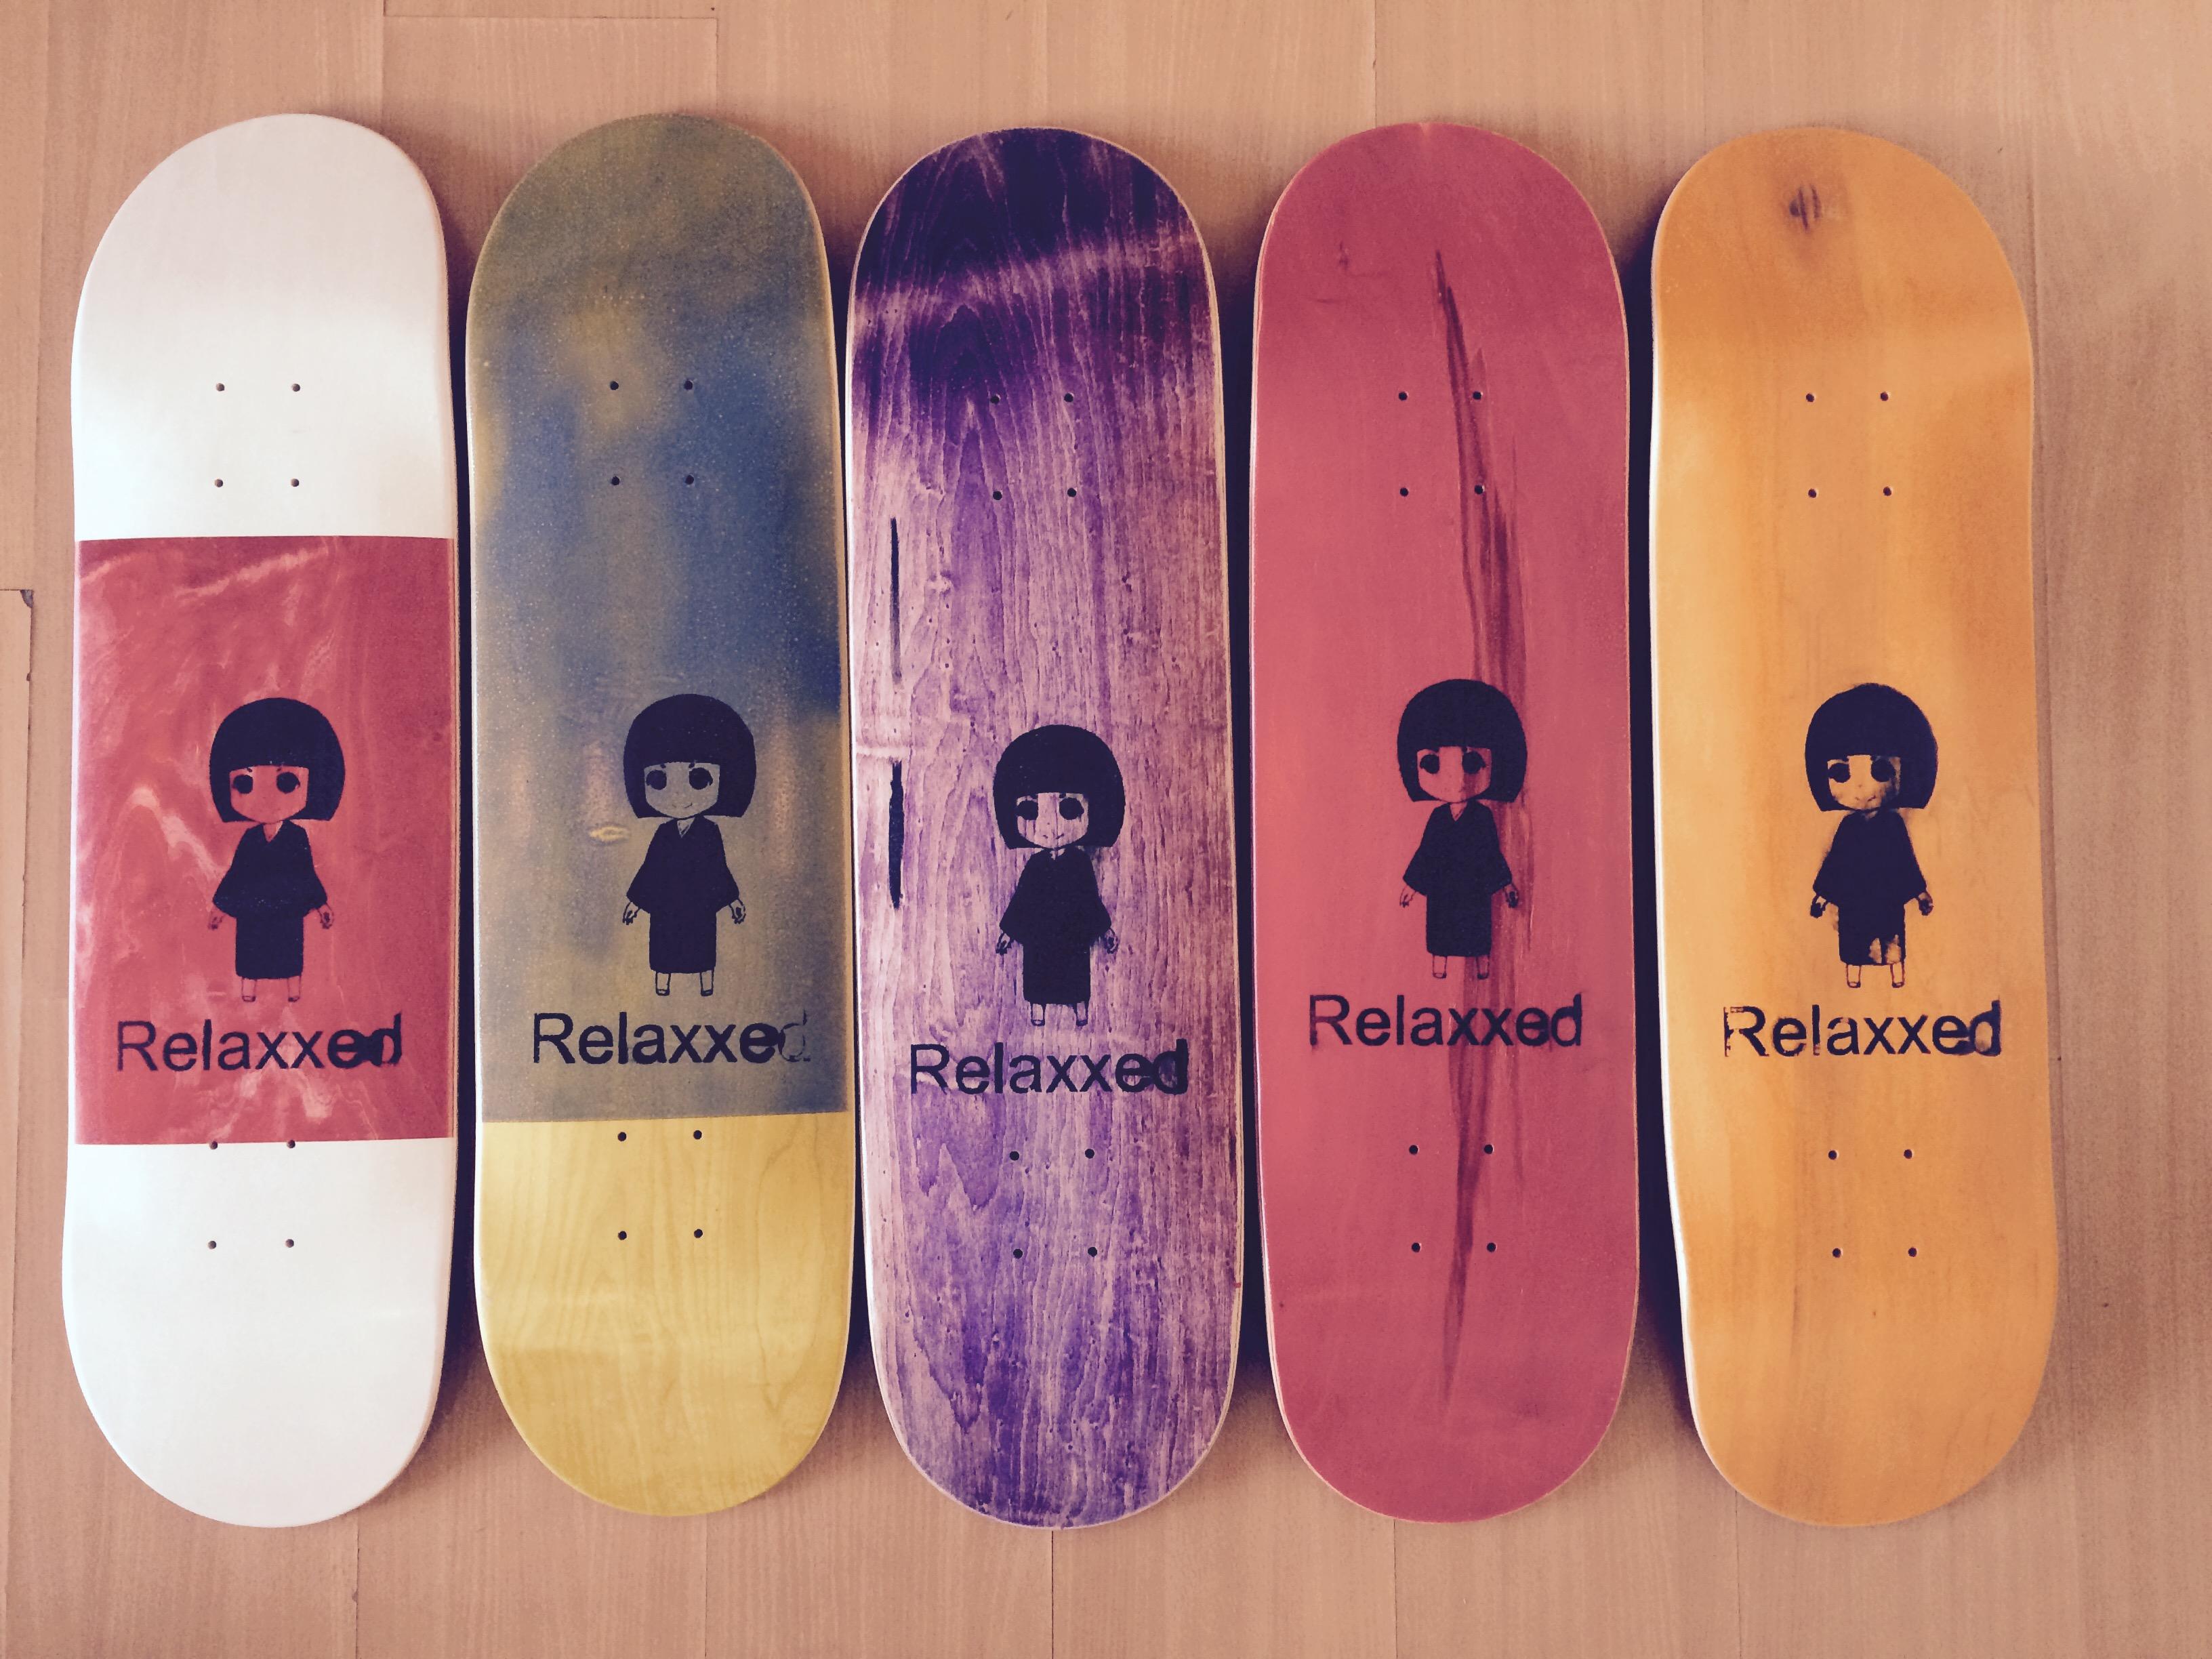 relaxxed pro decks asian 5 colors scheme